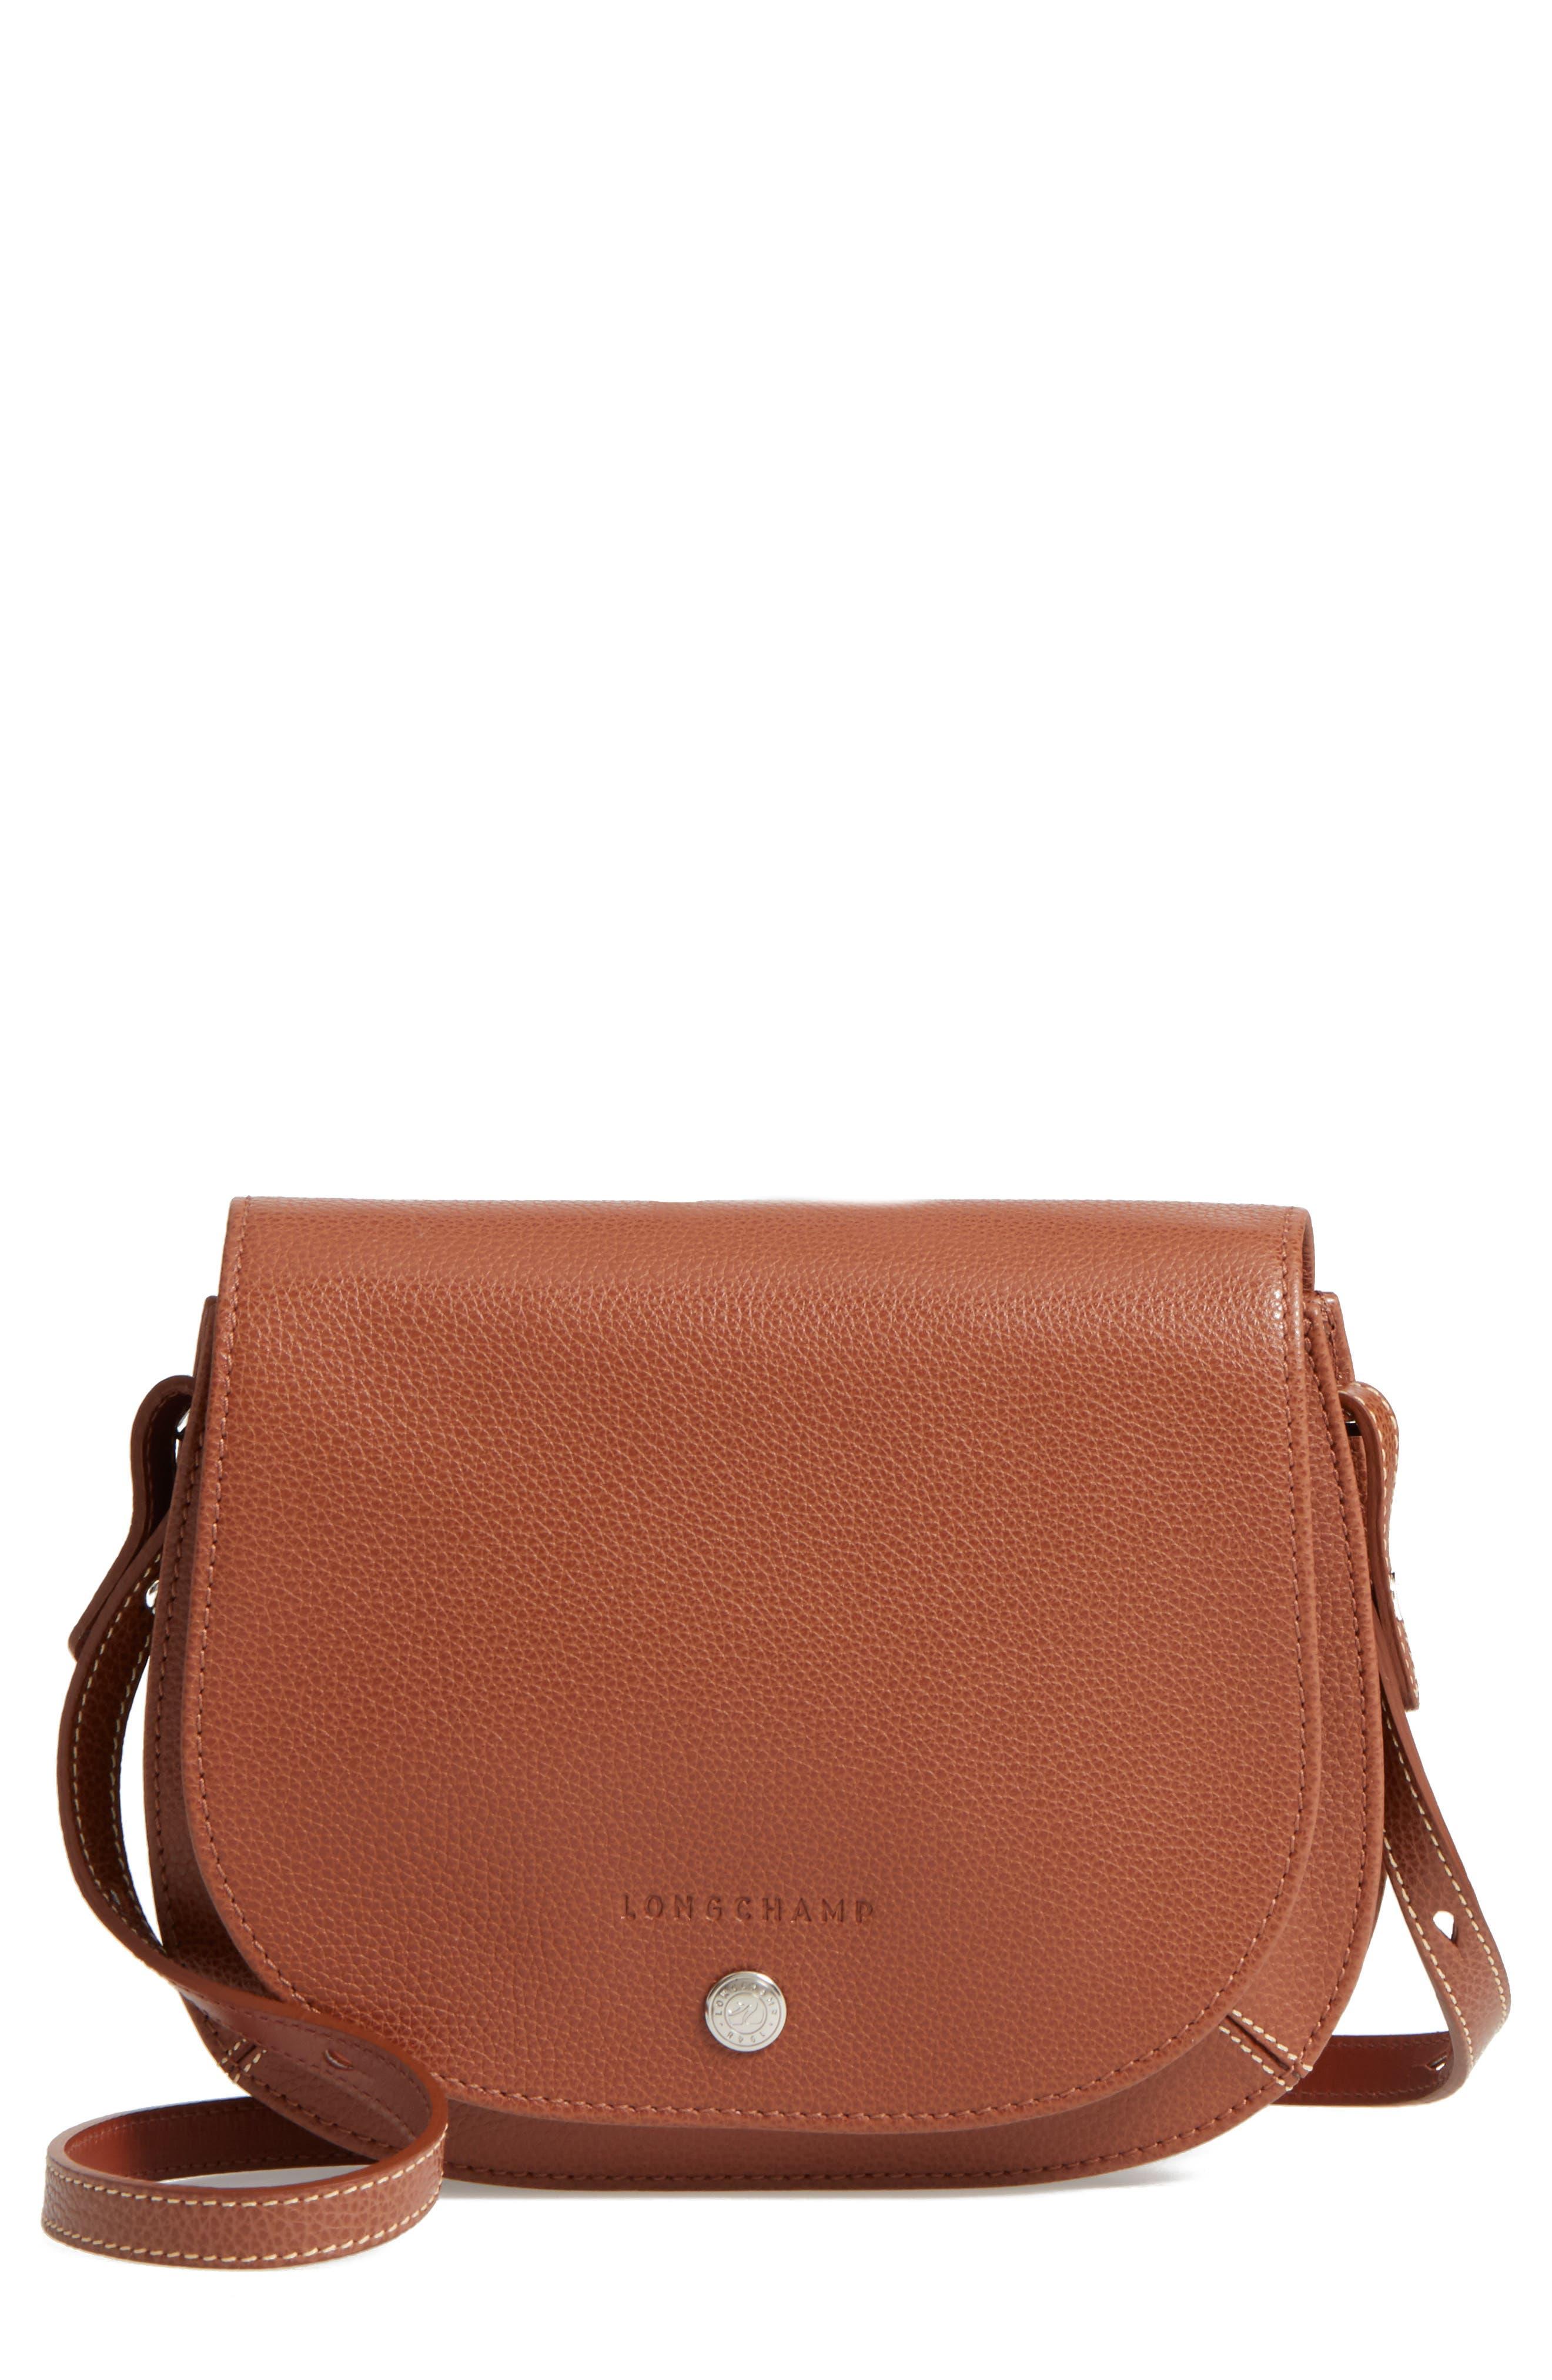 Longchamp Small Le Foulonne Leather Crossbody Bag